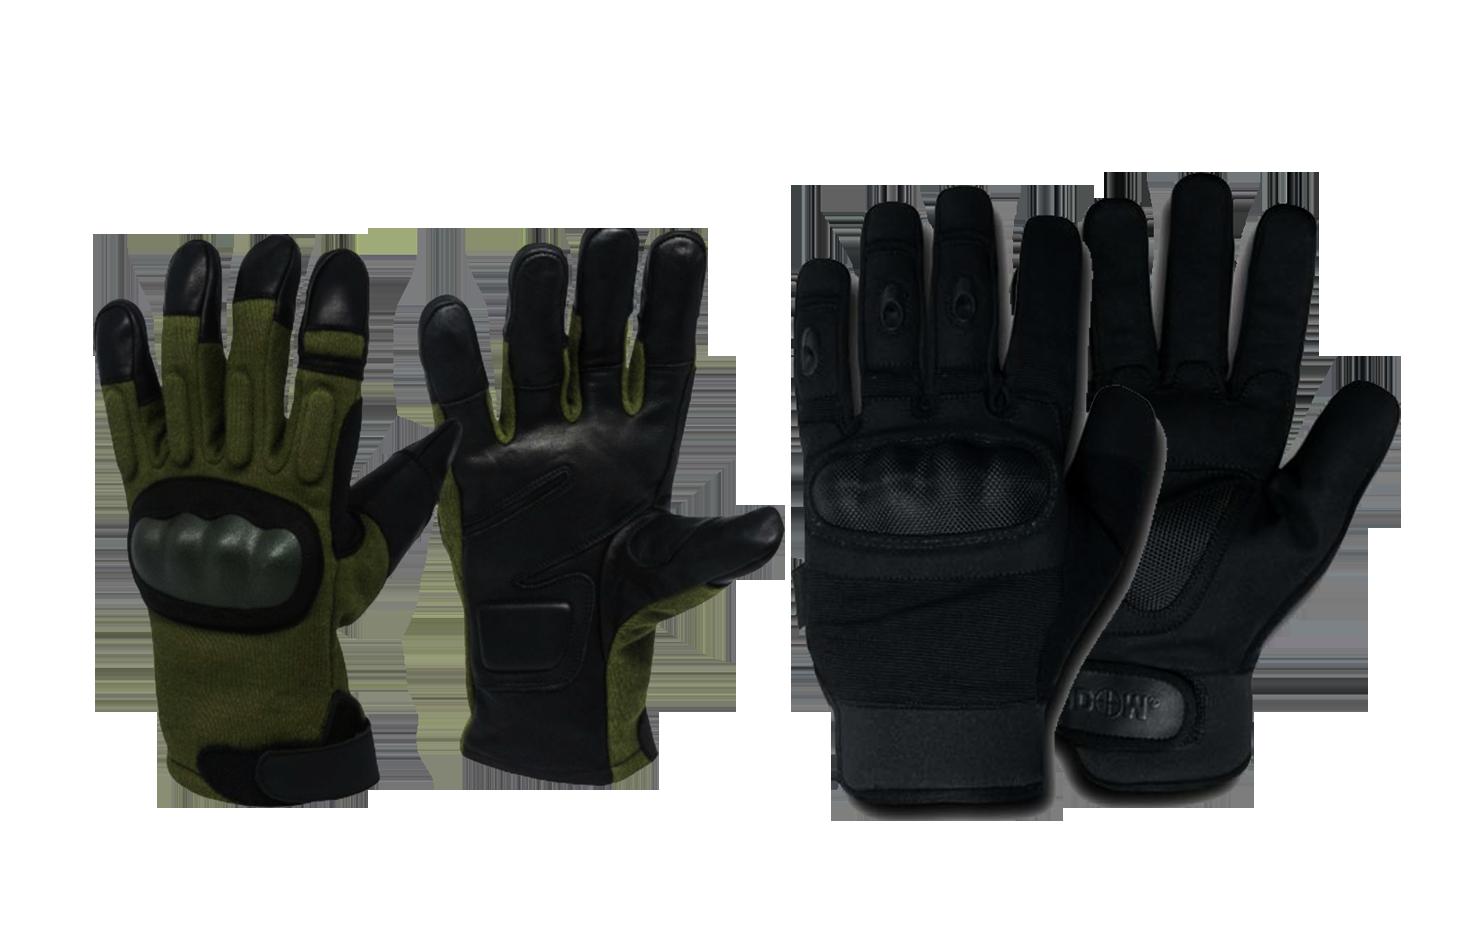 kevlar tactical gloves at bereli